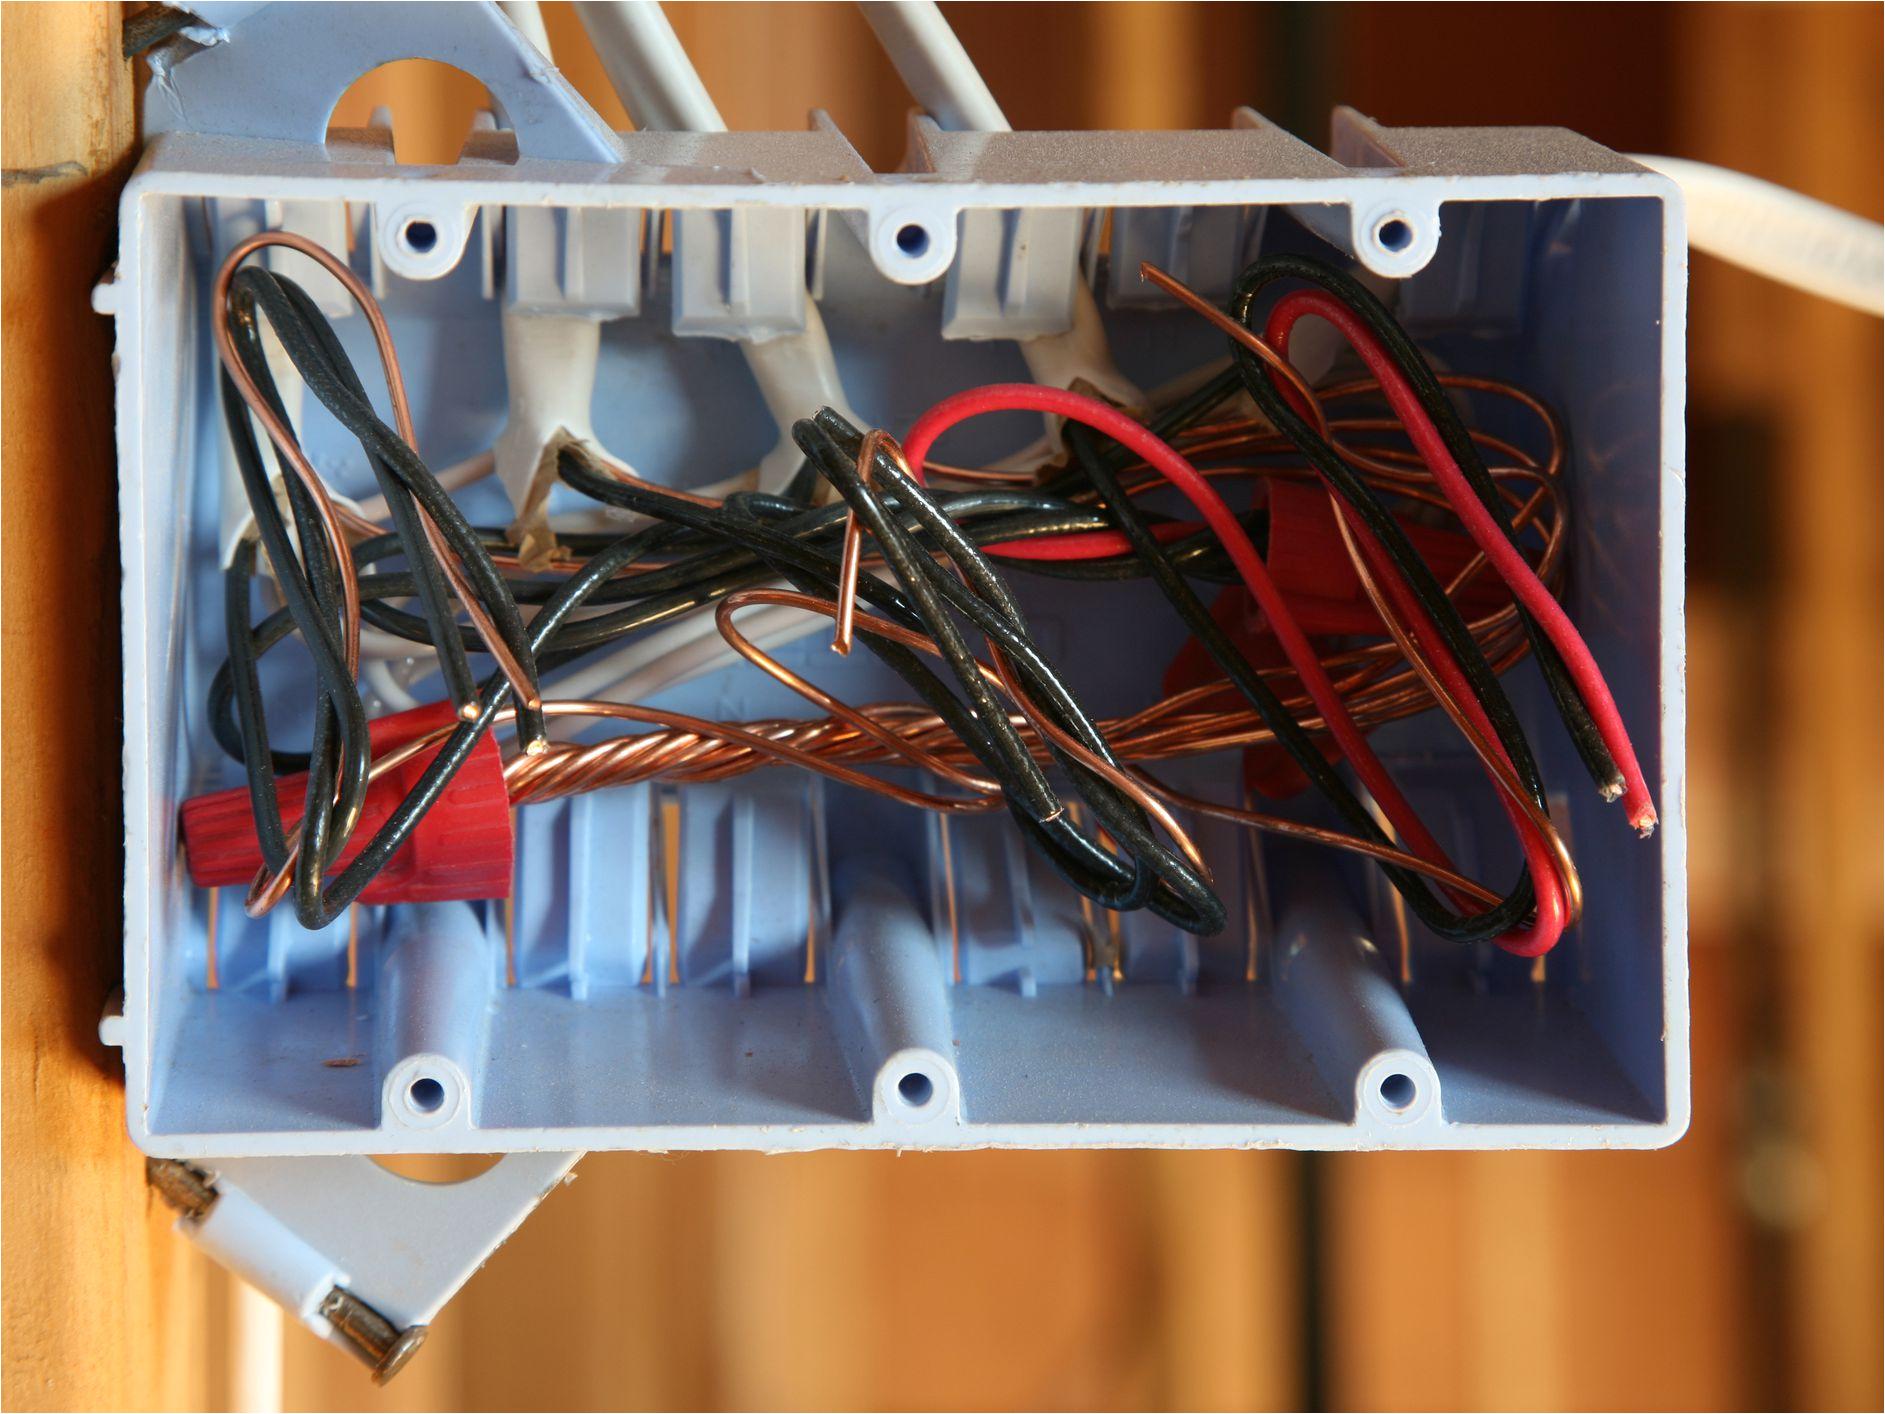 plasticelectricalbox gettyimages 173870797 59fff27ab39d030019cc0d57 jpg